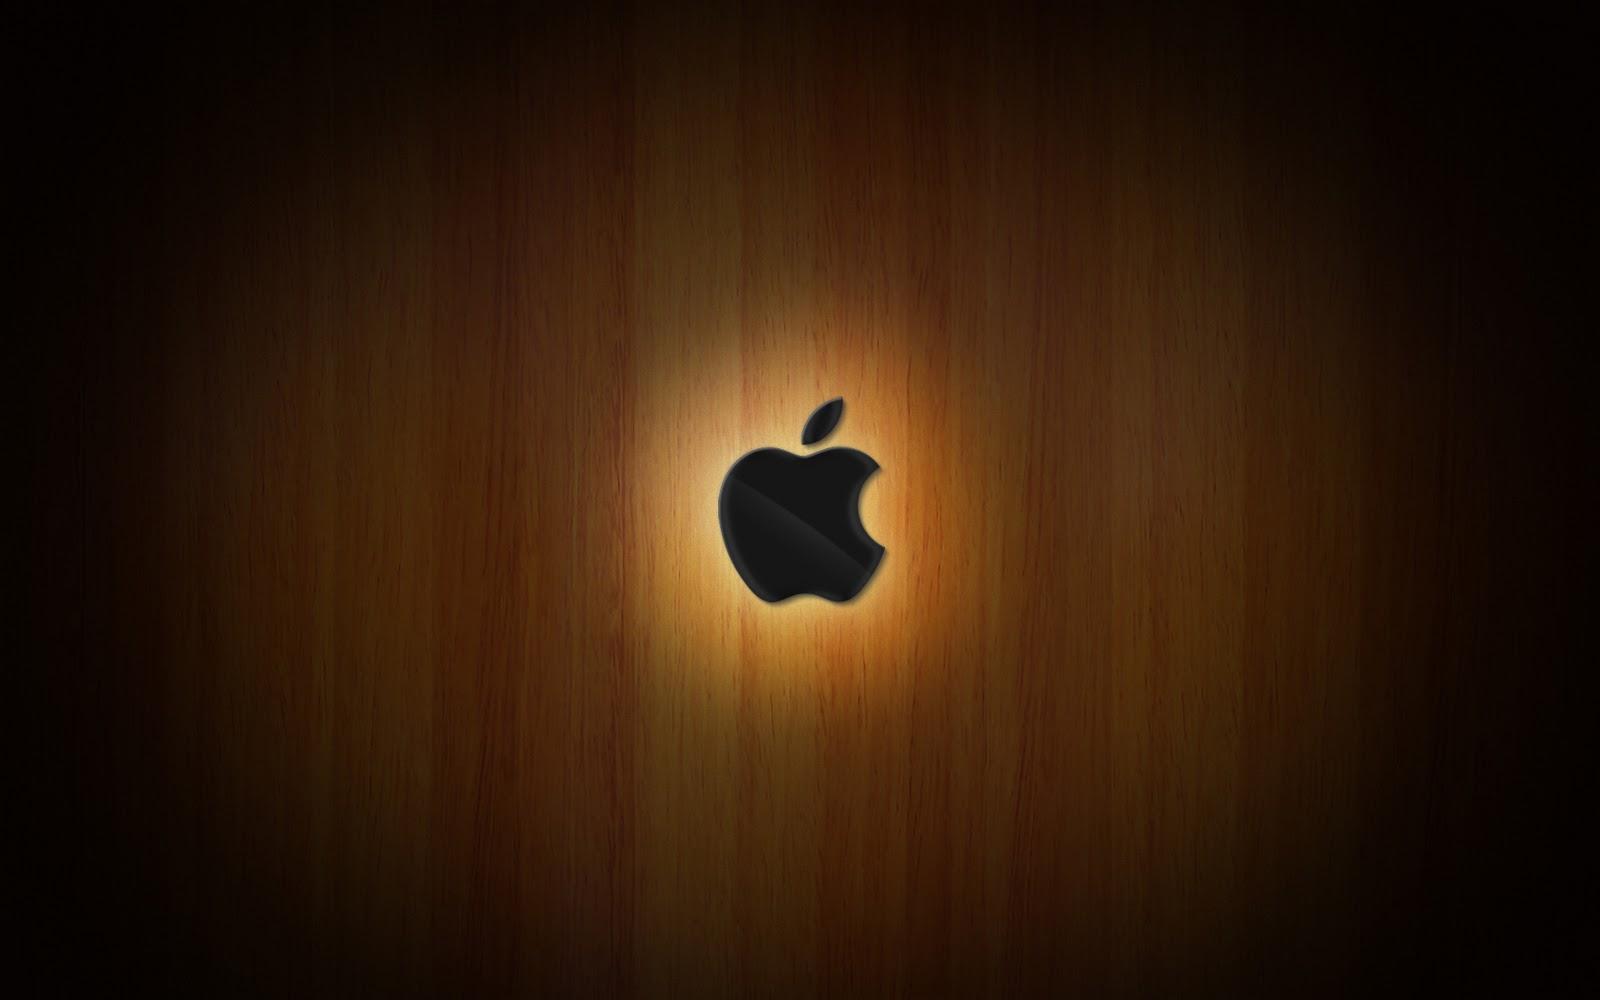 http://1.bp.blogspot.com/-j6CtKMMHJBQ/Tq_0HgrBJ6I/AAAAAAAAHZM/fKHsWboEIfA/s1600/Classic-Apple-Desktop-Wallpaper.jpg